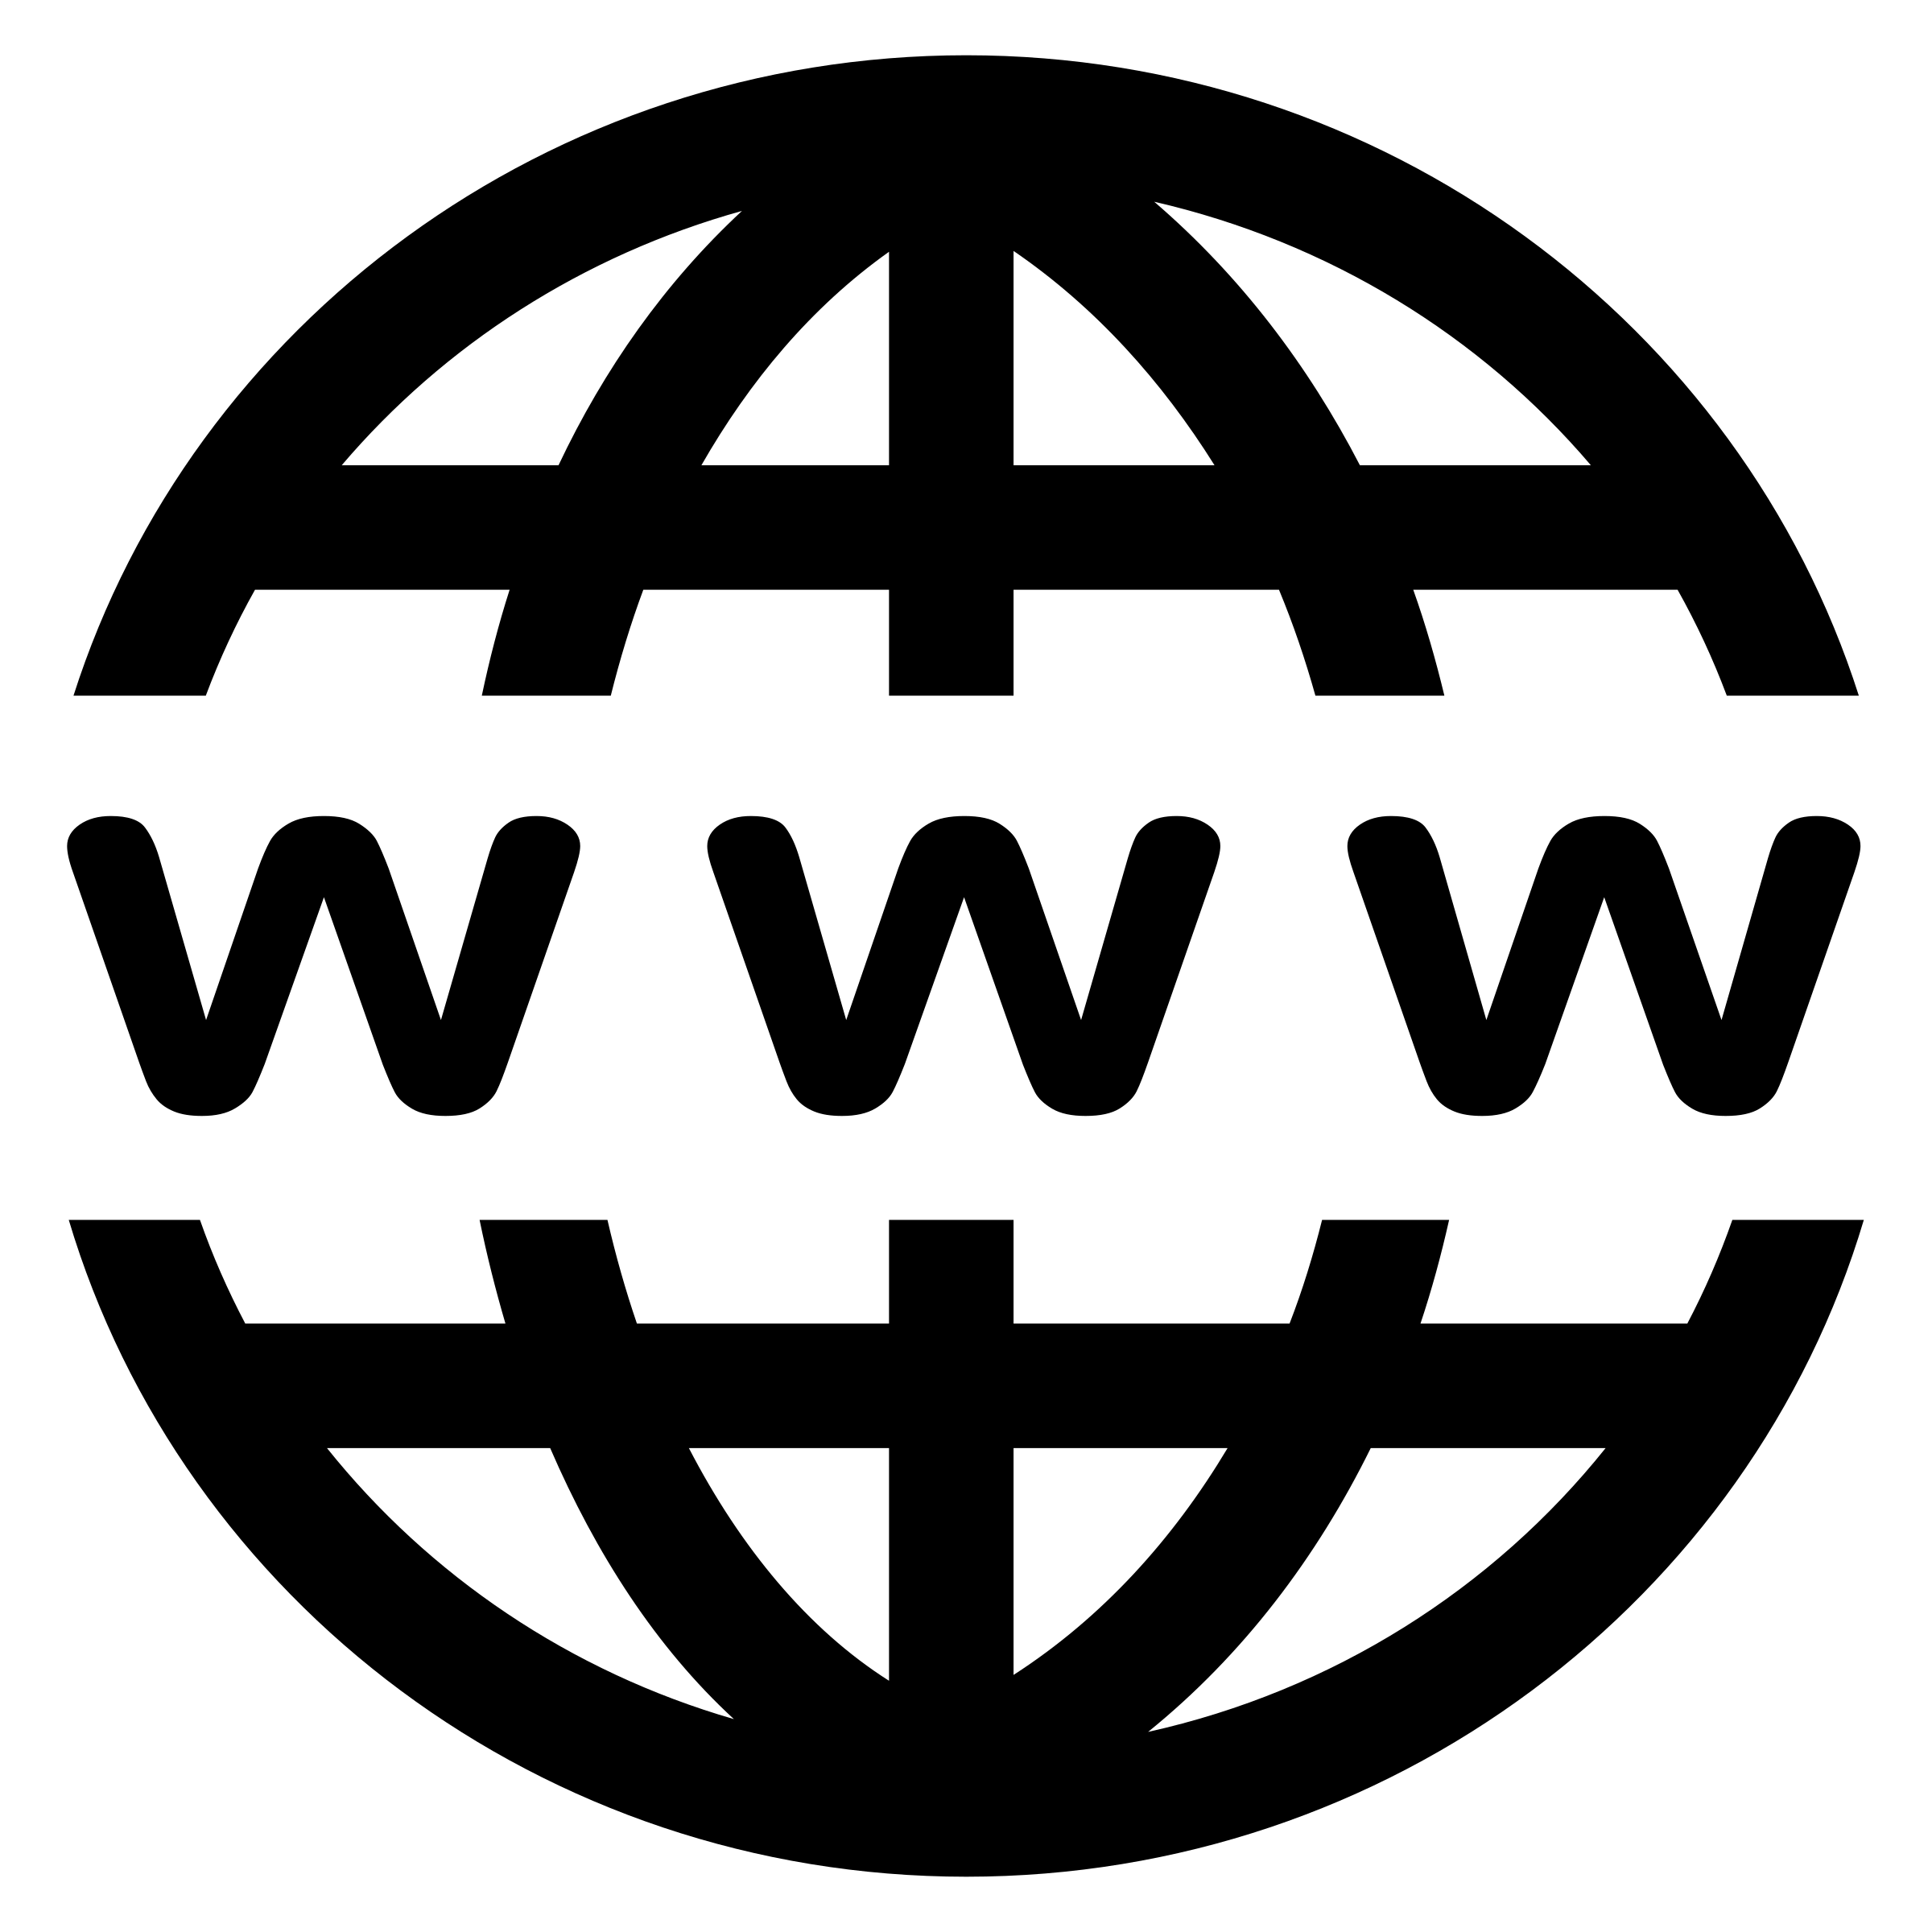 Internet Clipart